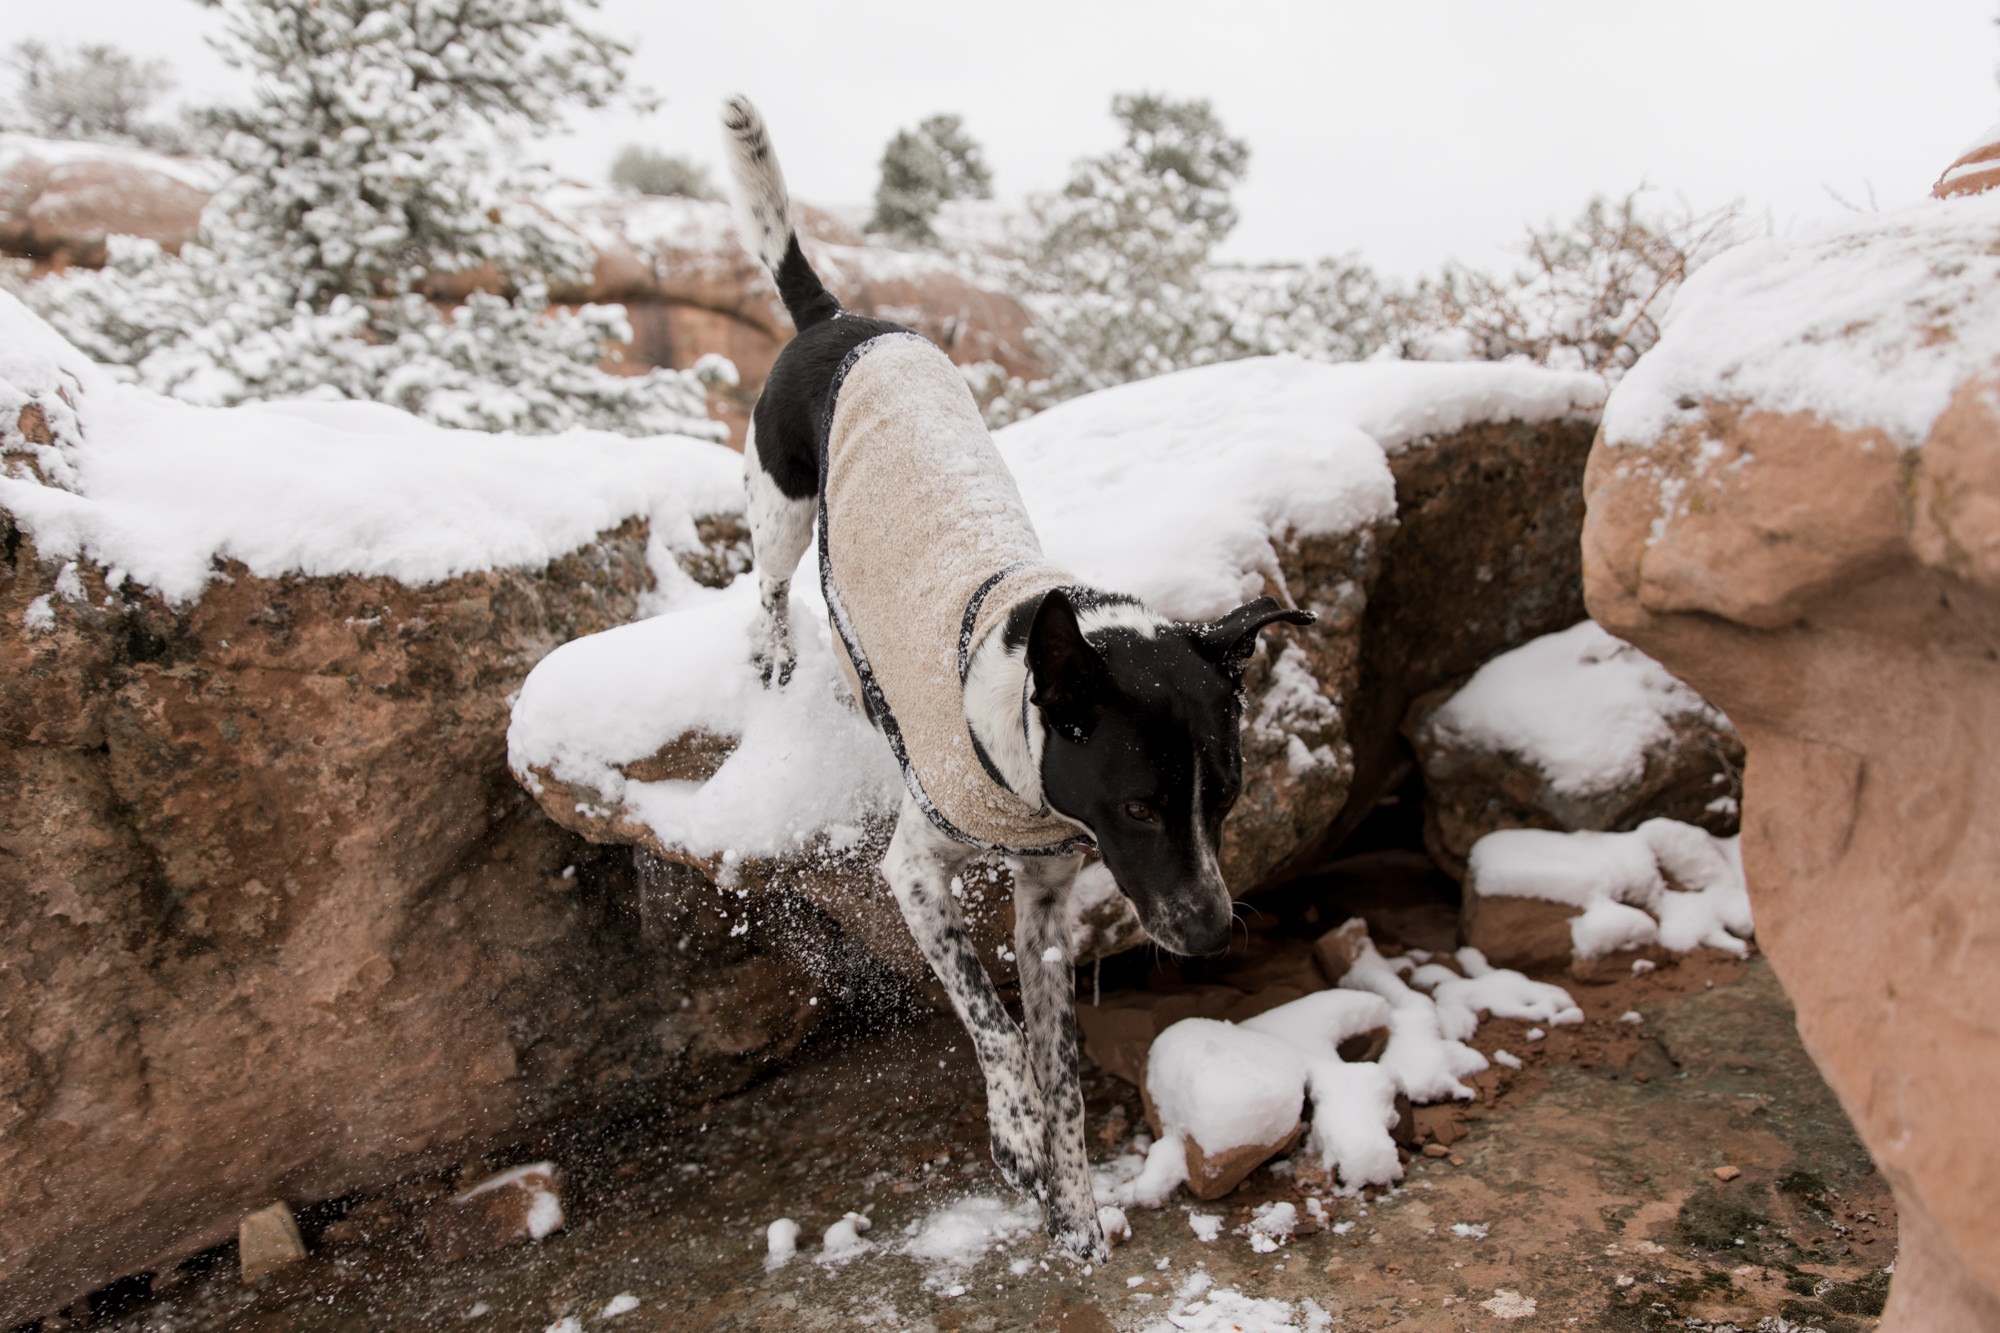 Moab-utah-adventure-10.jpg